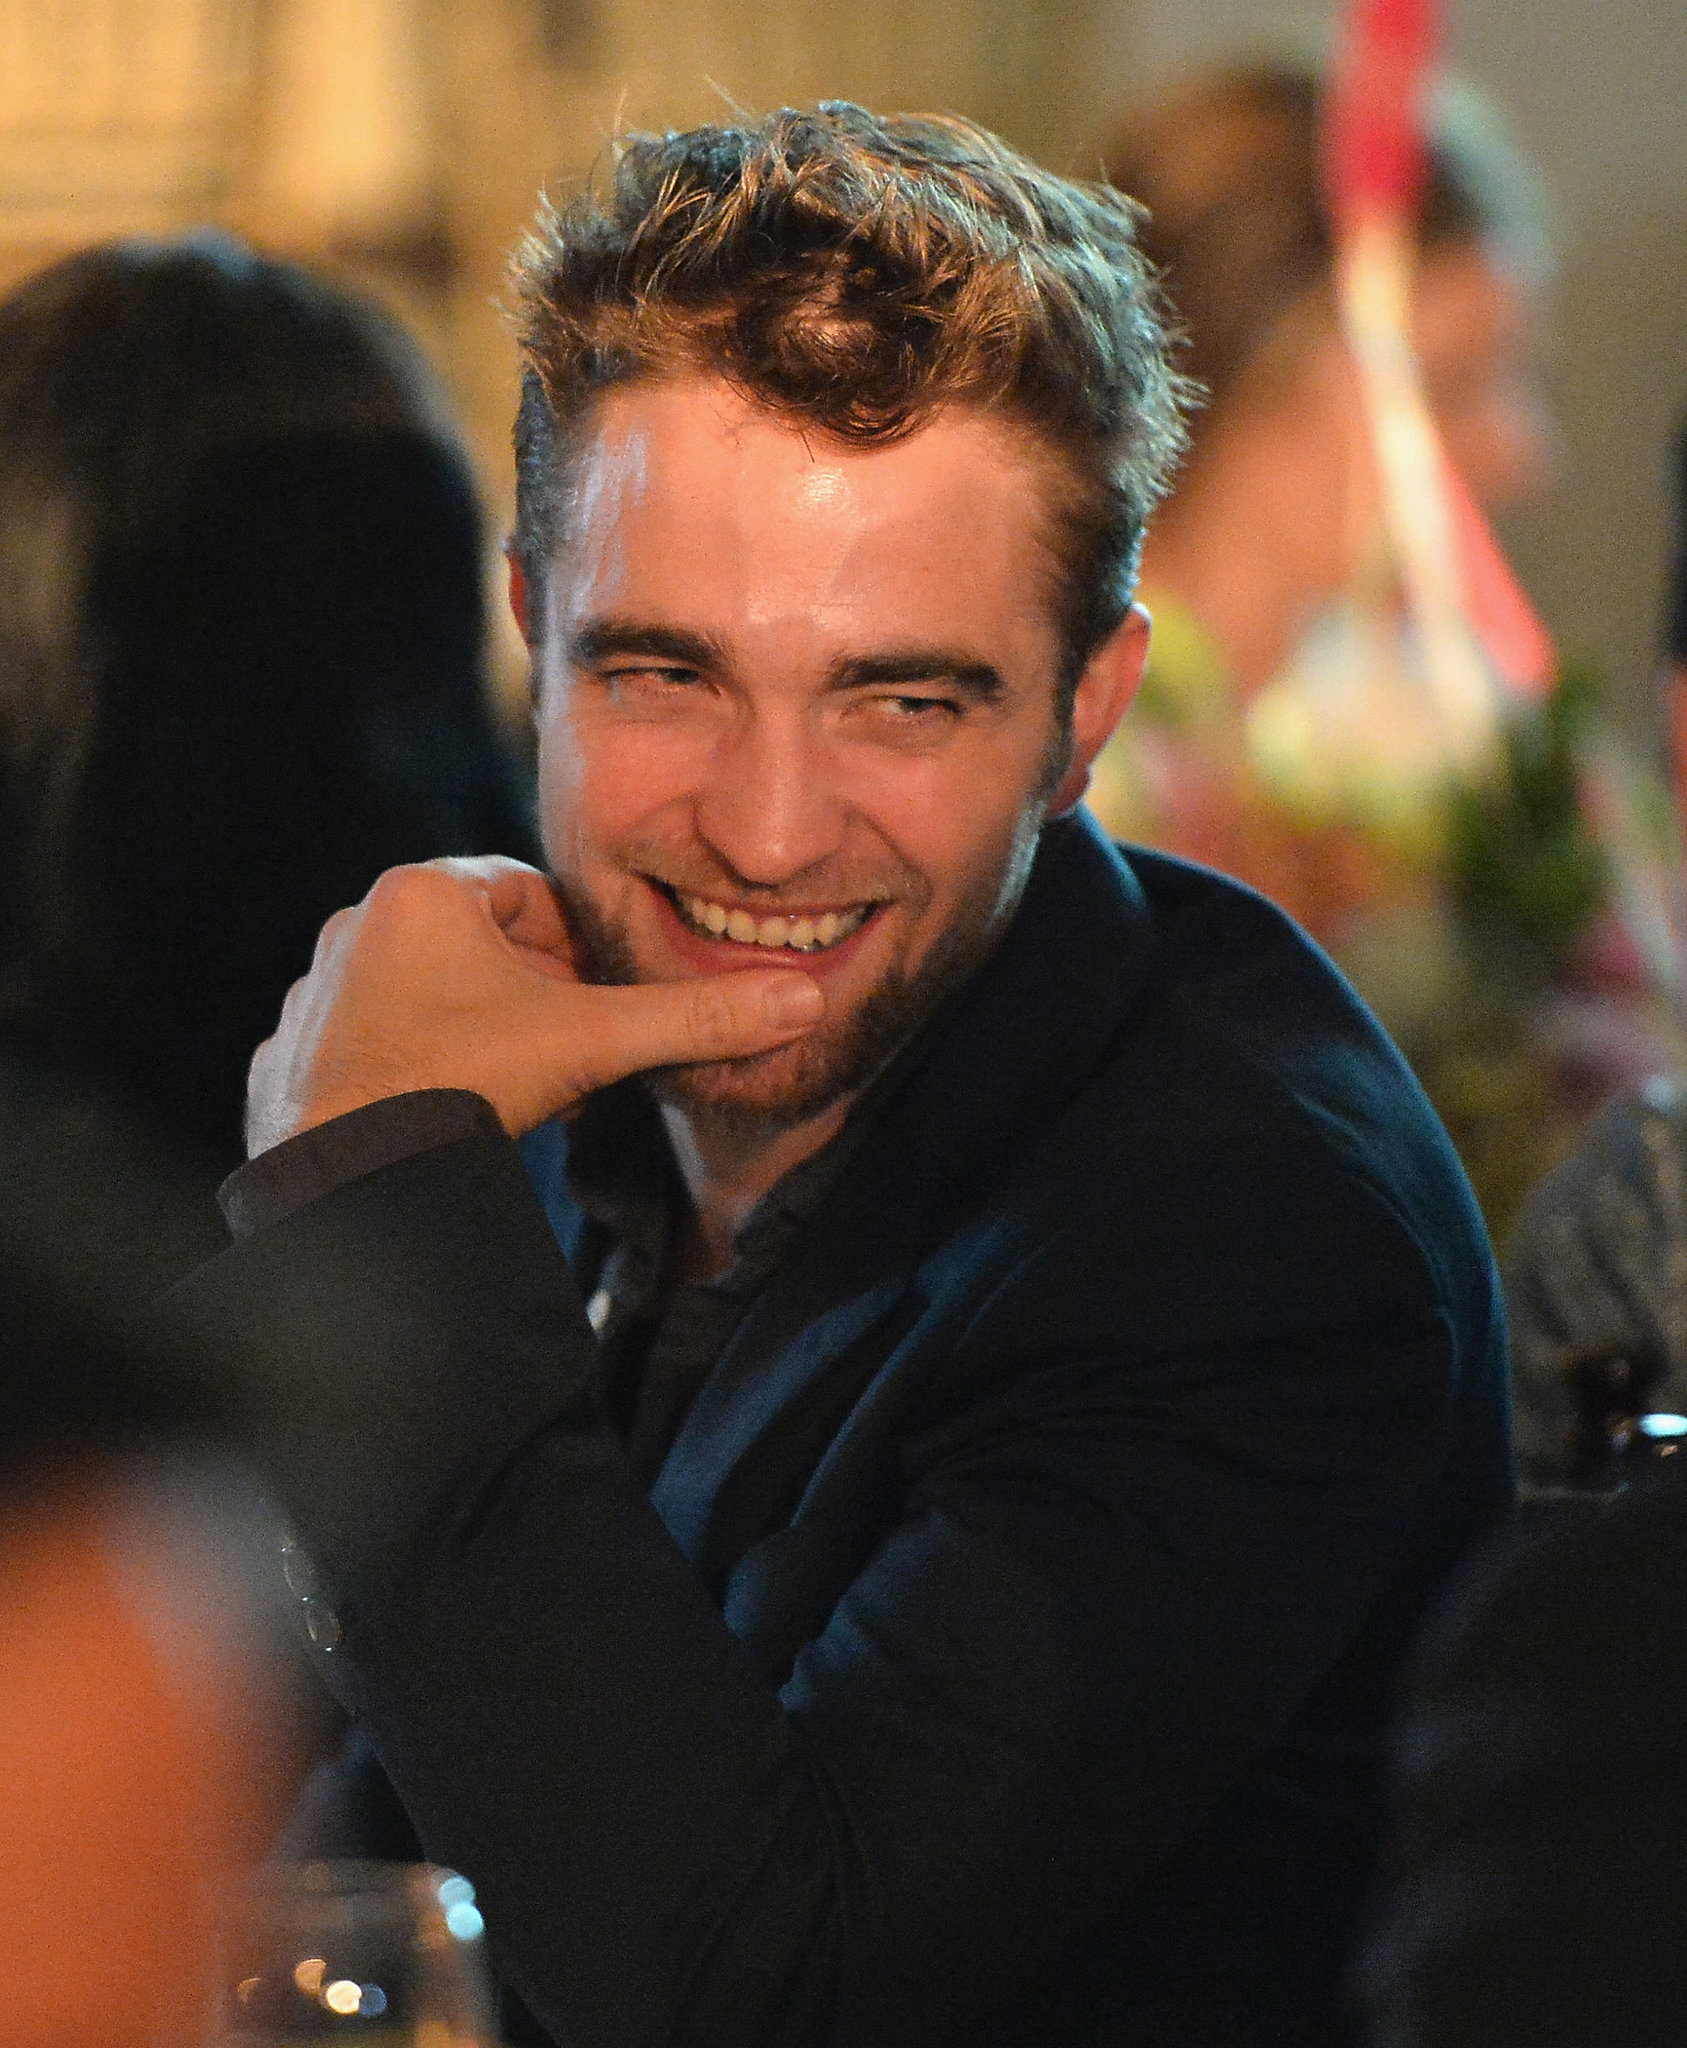 Robert Pattinson: Robert Pattinson Dior Fragrance Campaign And Beauty